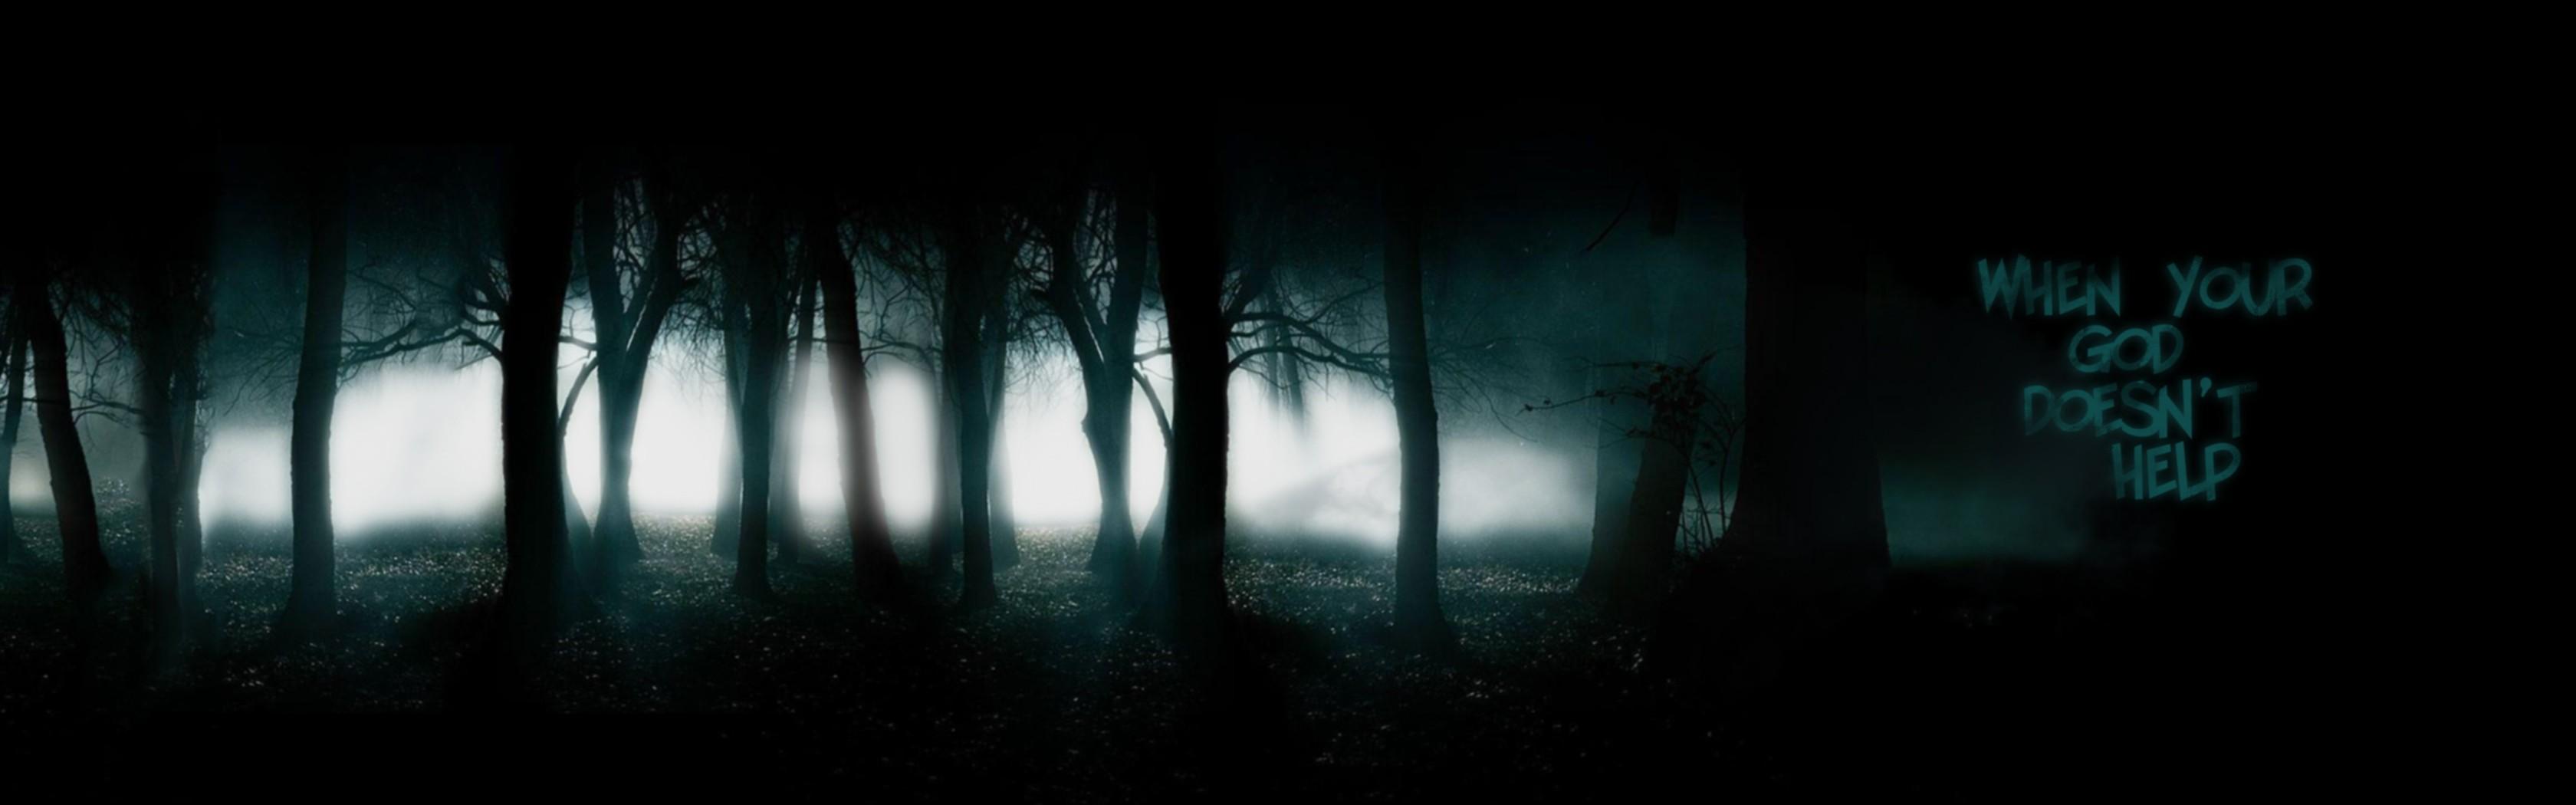 dark-wallpaper-wpc5803950